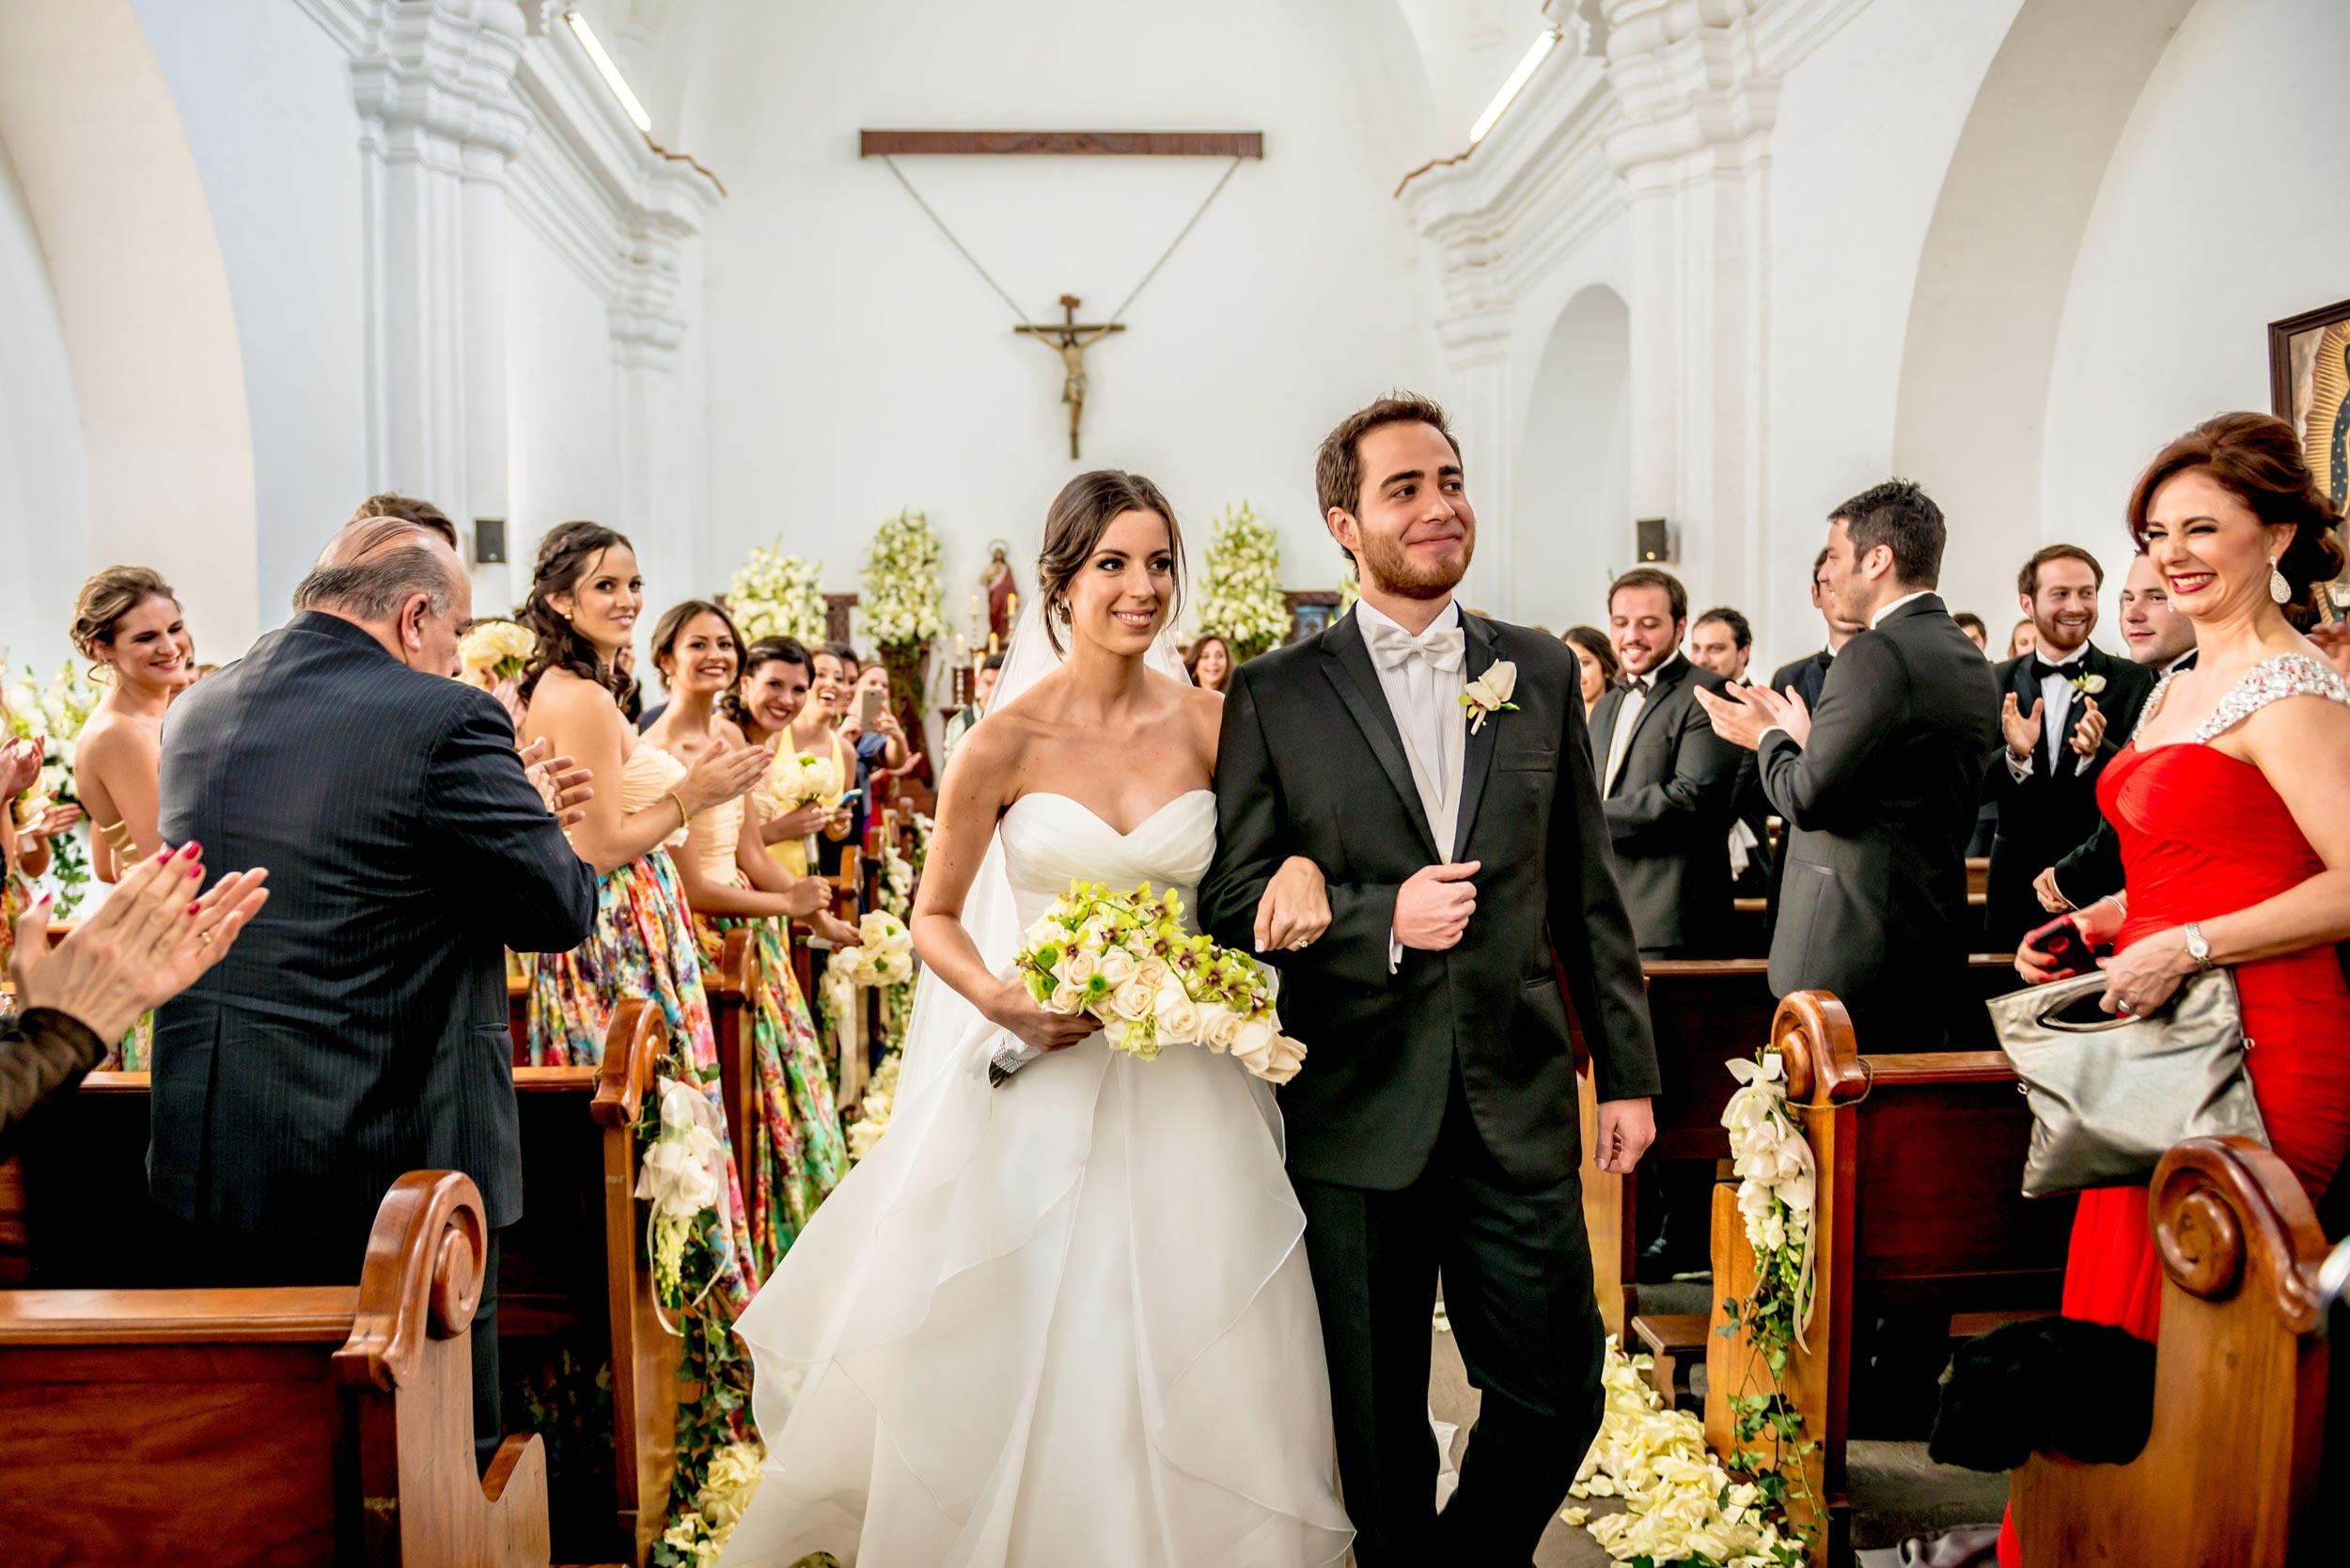 Matrimonio-en-la-Iglesia-Católica-3